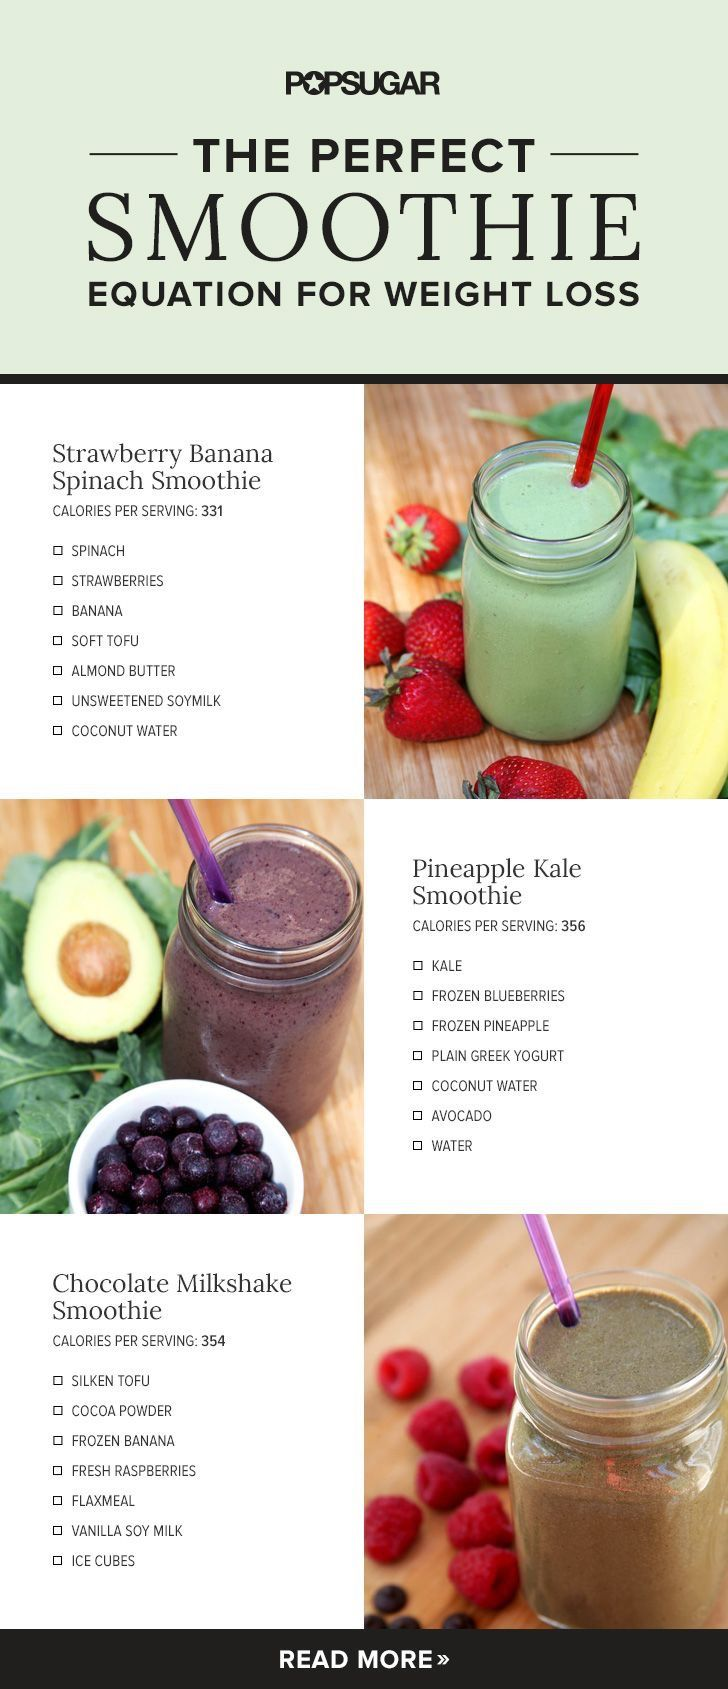 Free meal plan to lose weight